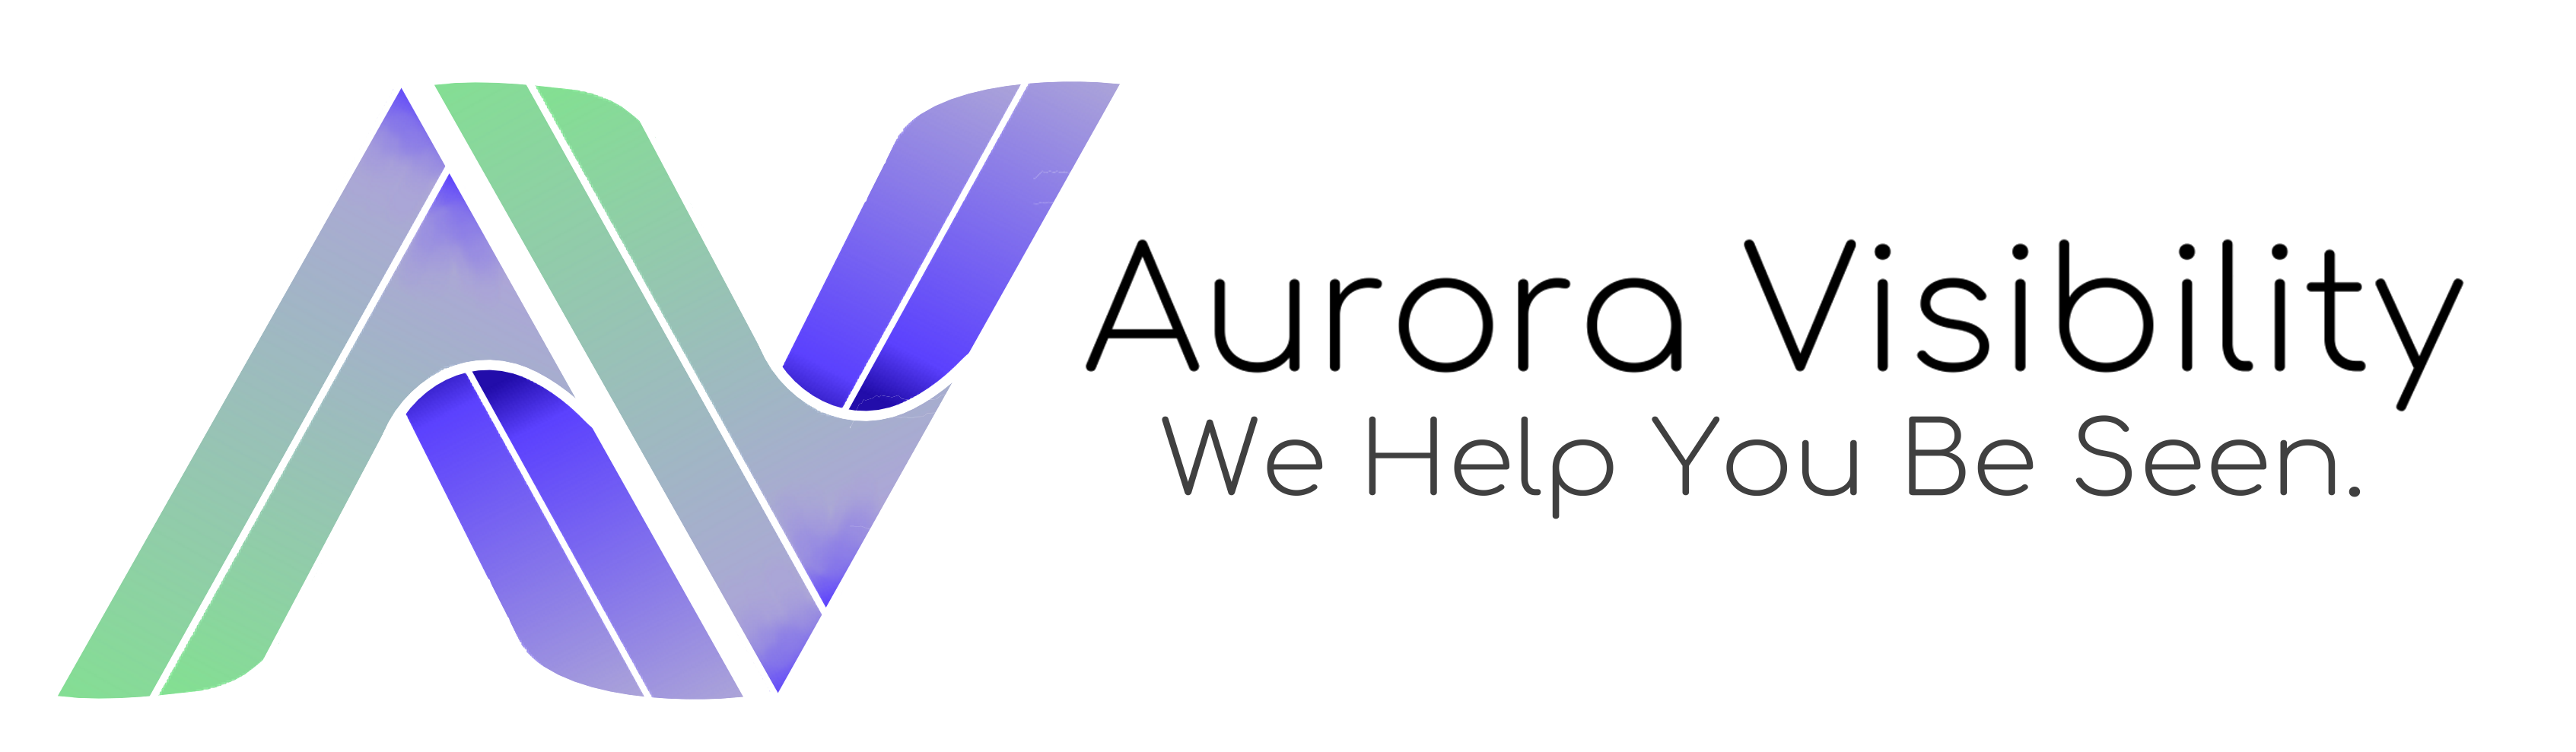 AuroraVisibility